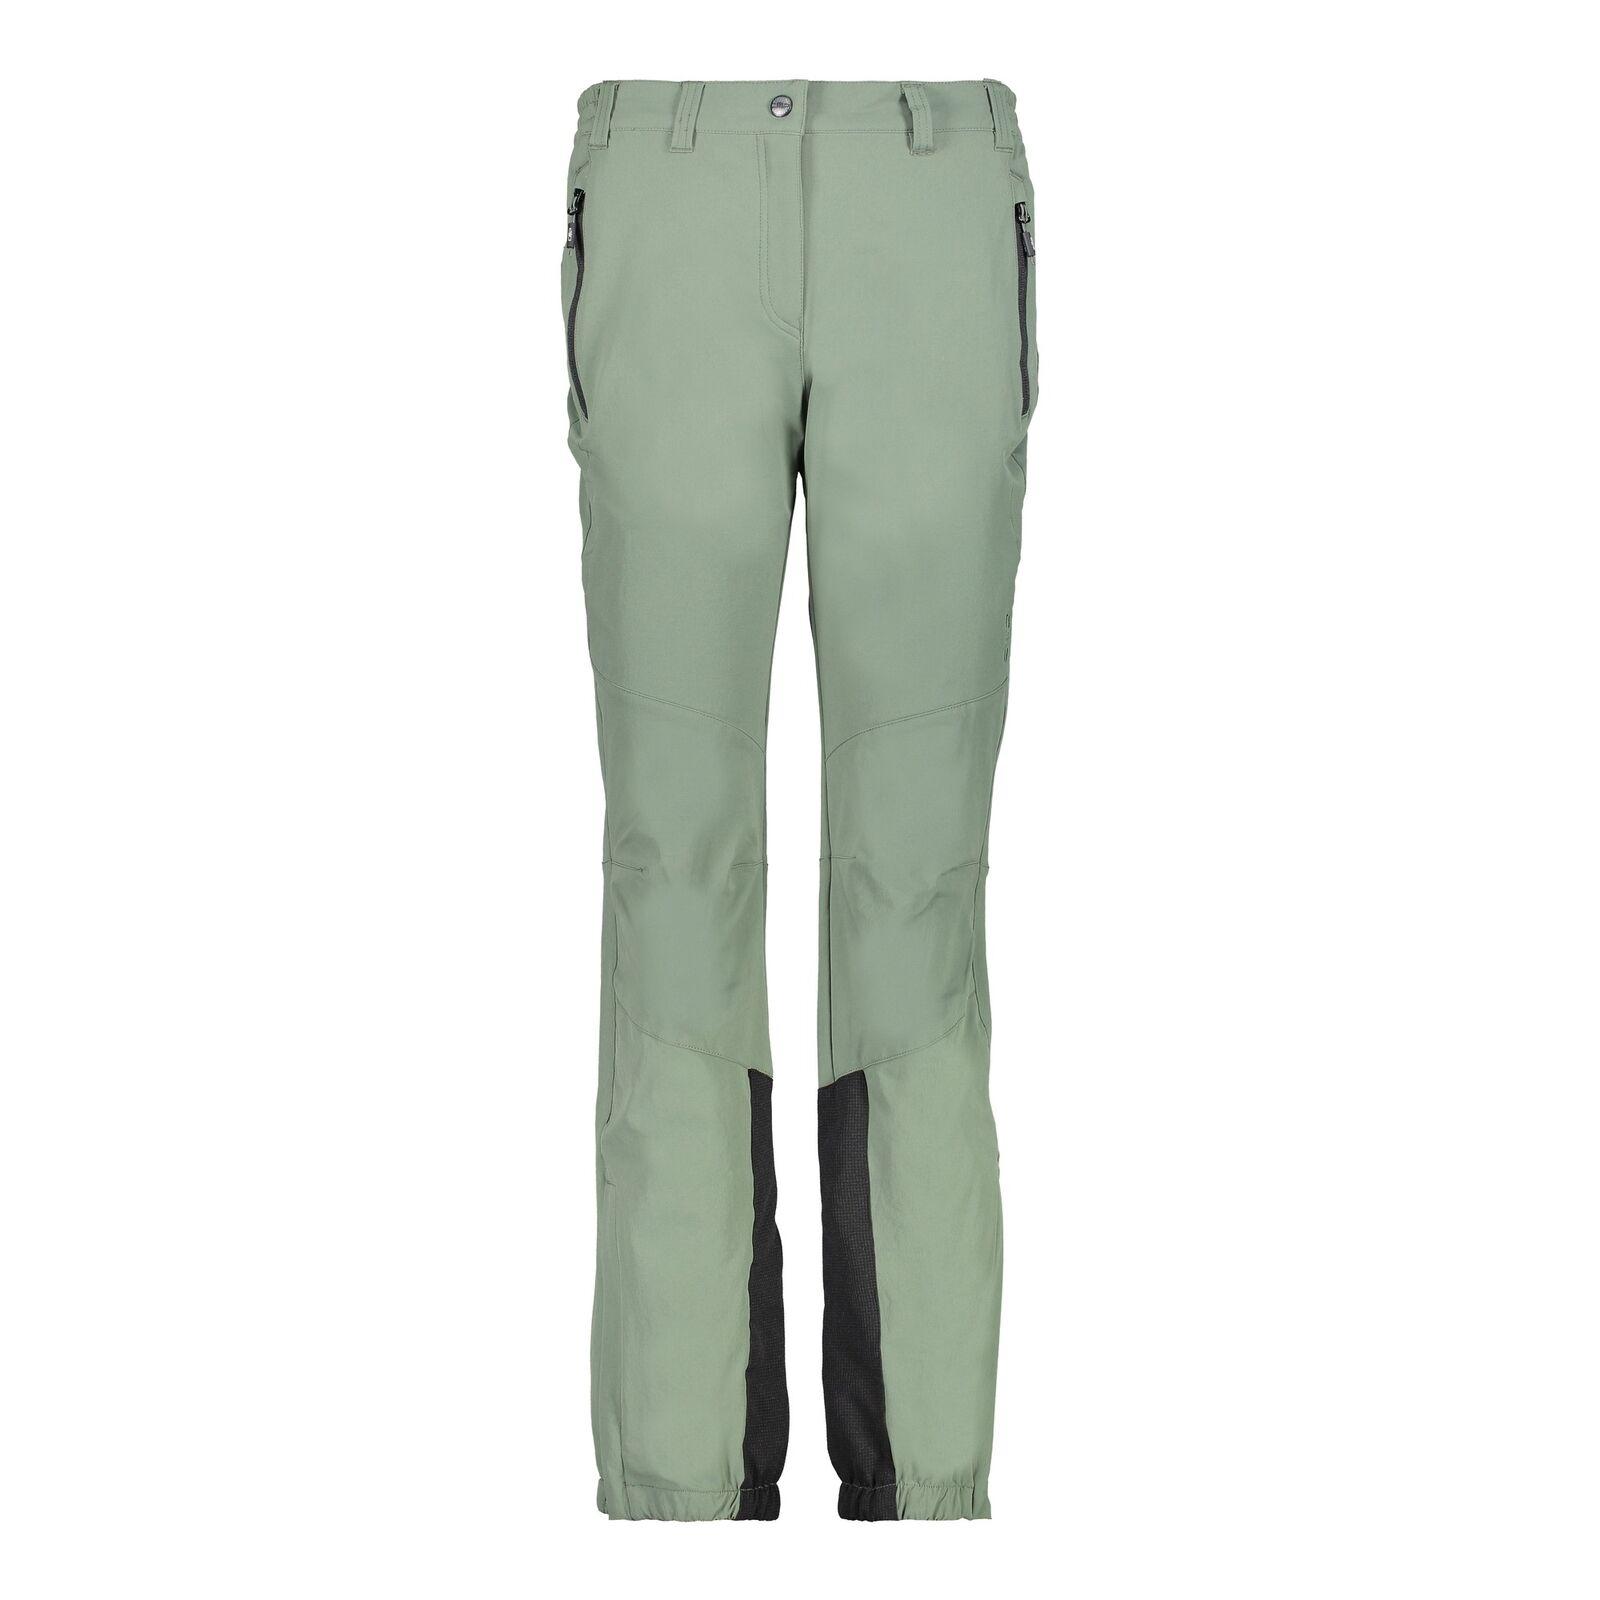 Funzione CMP Pantaloni wanderhosen WOMAN LONG PANT verde ELASTICO STRETCH